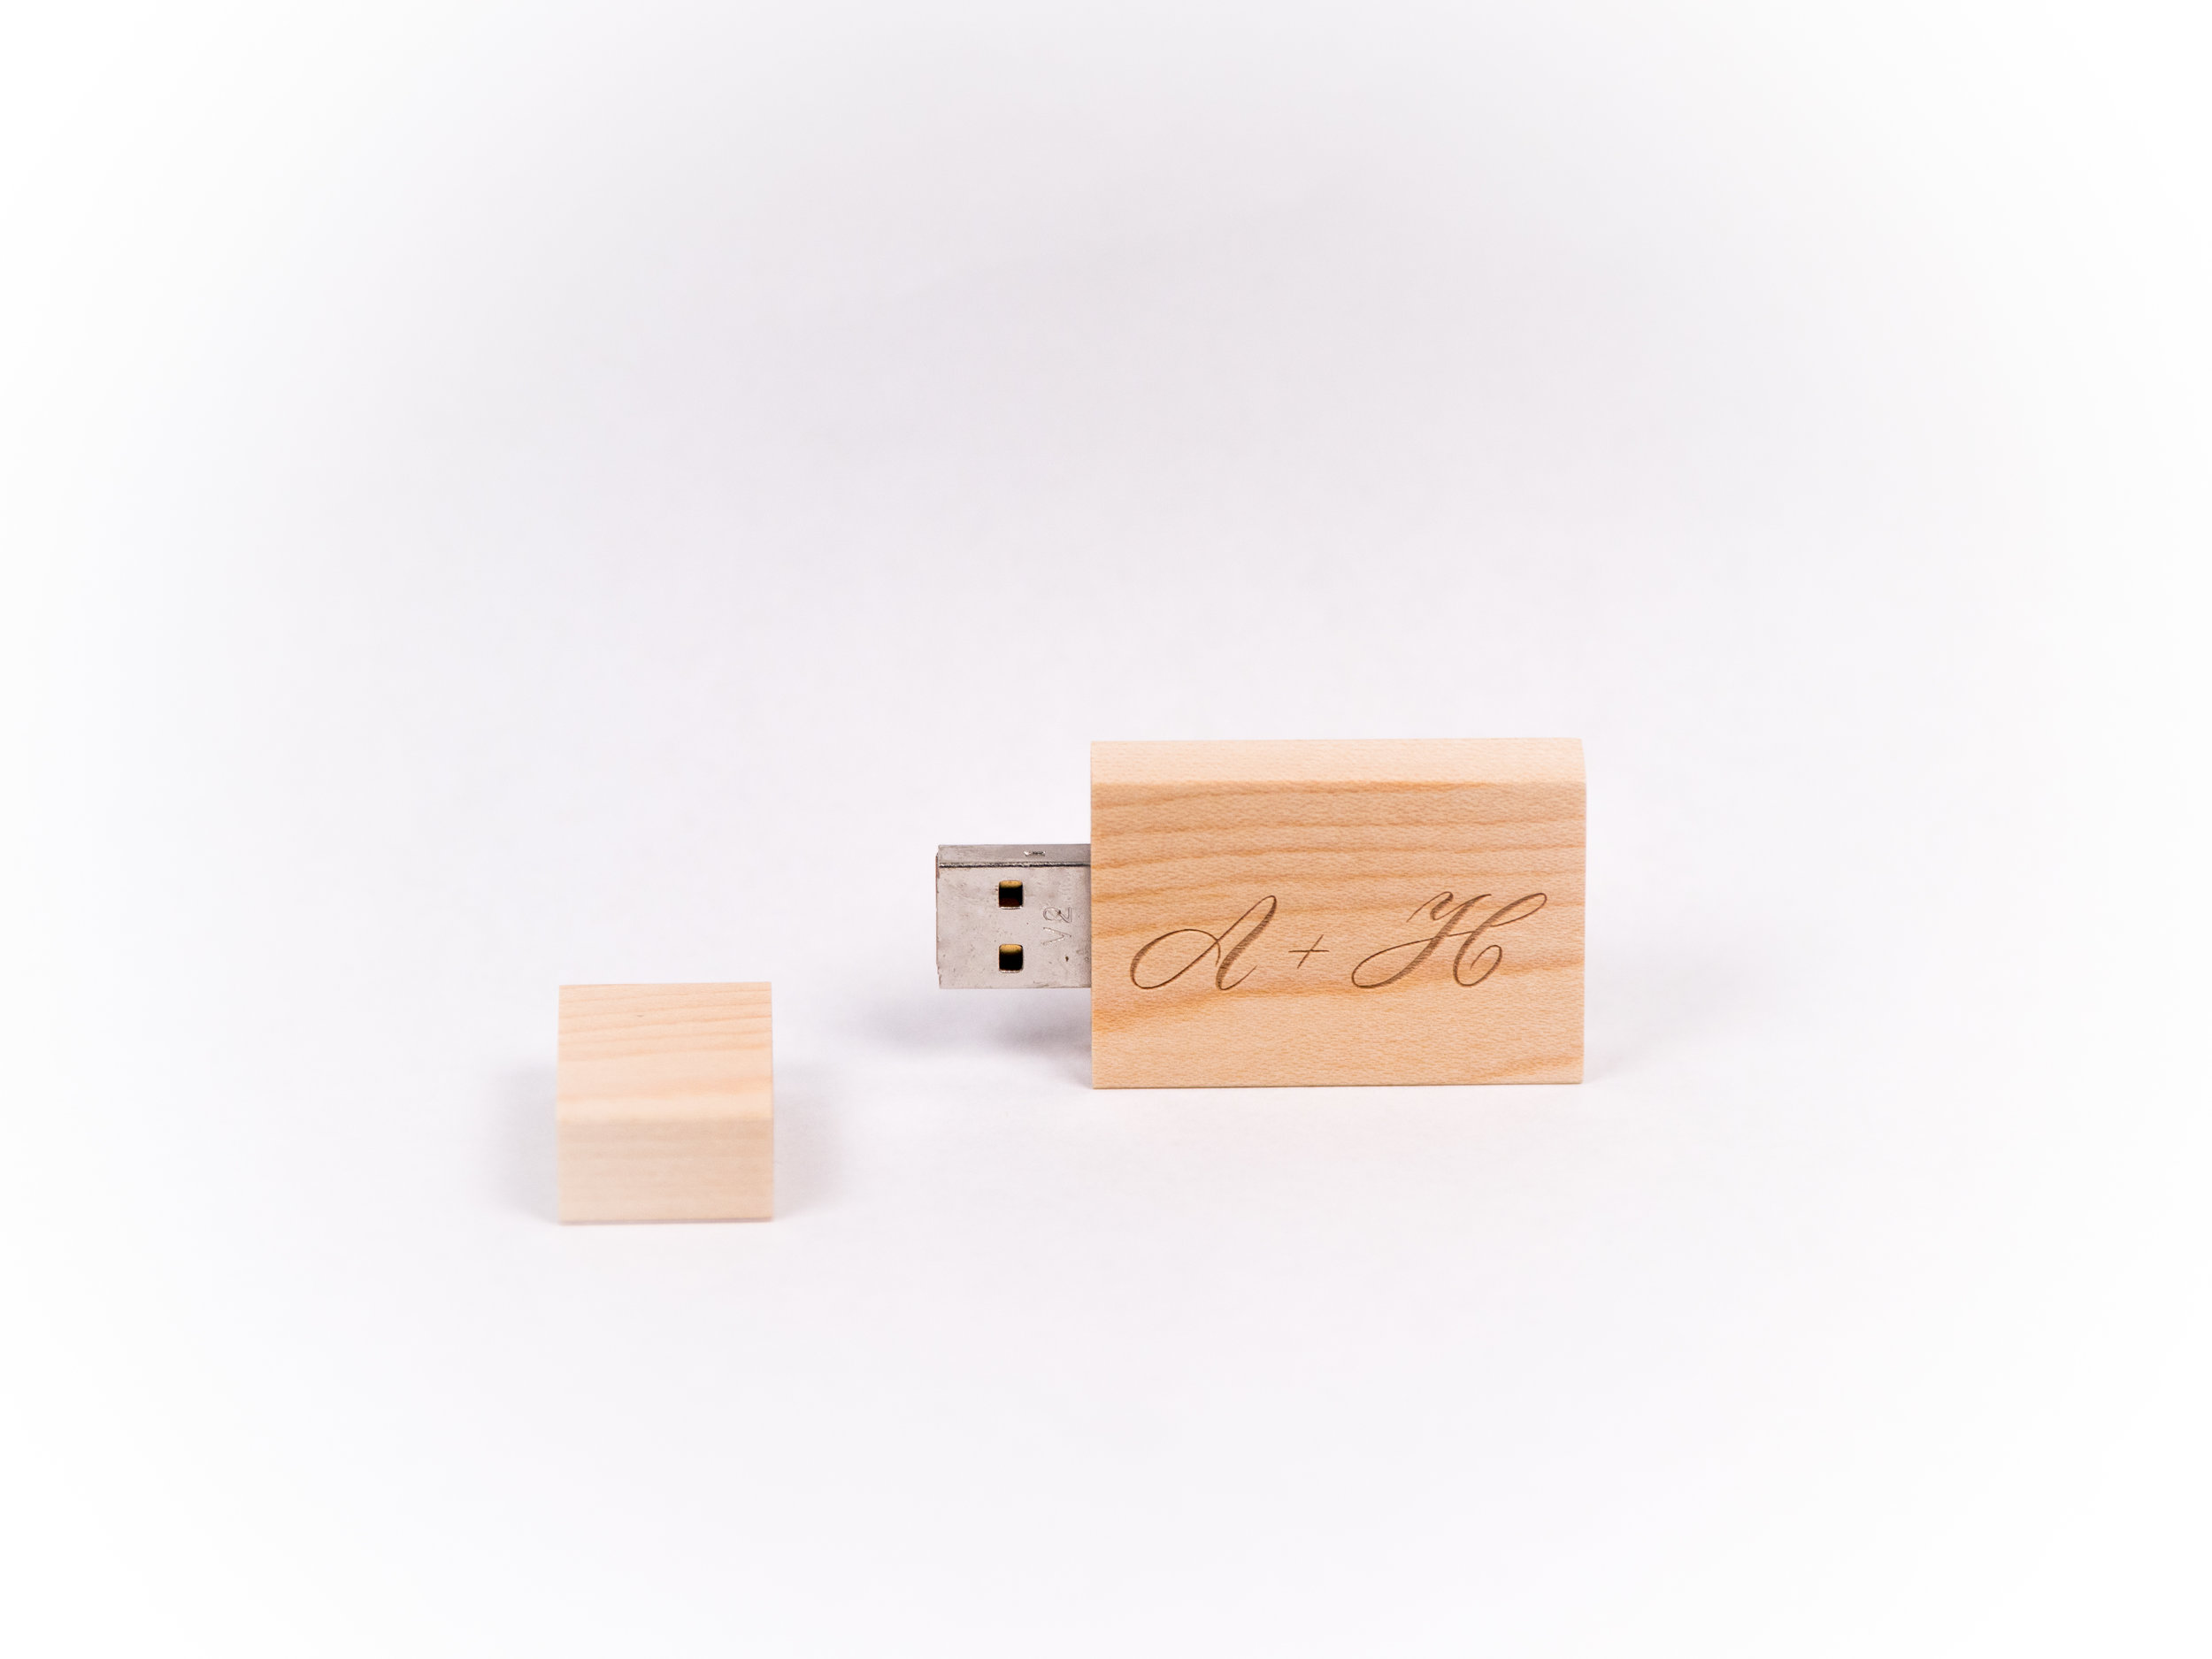 flash drive close up.JPG